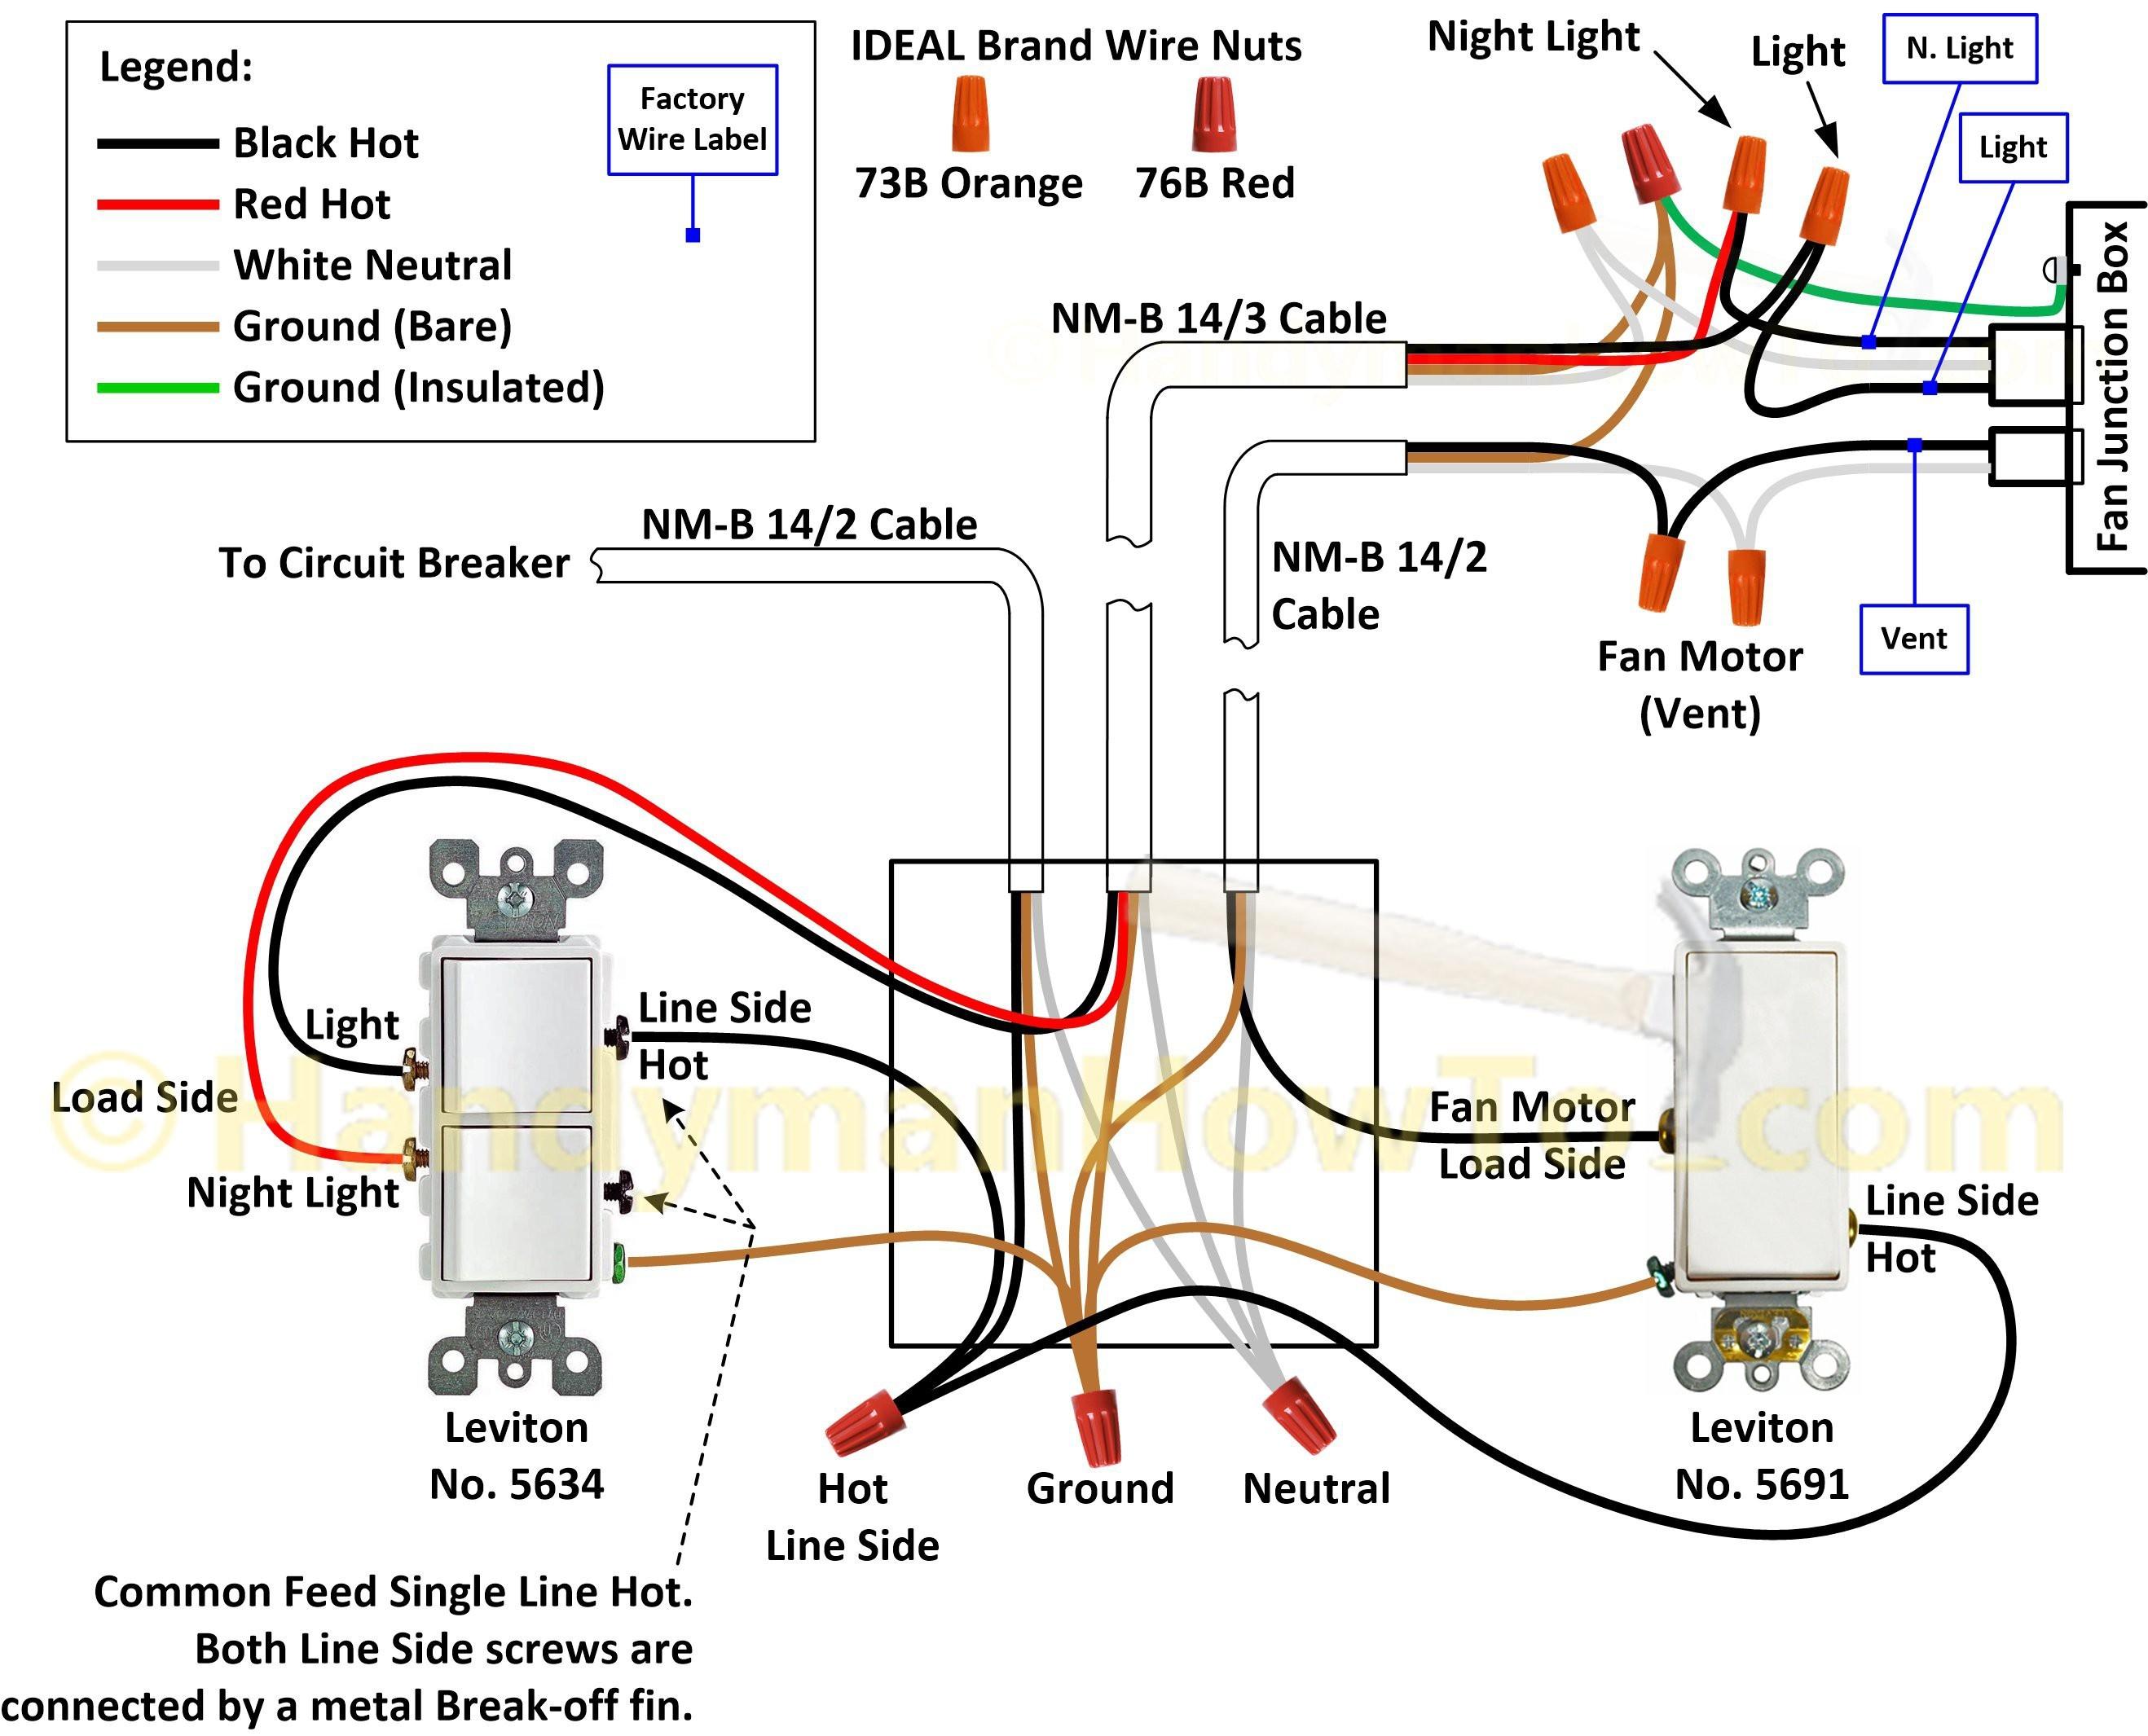 single gfci wiring diagram Collection-single gfci wiring diagram Download Awesome Gfci Wiring Diagram 1 p DOWNLOAD Wiring Diagram Sheets Detail Name single gfci 17-h